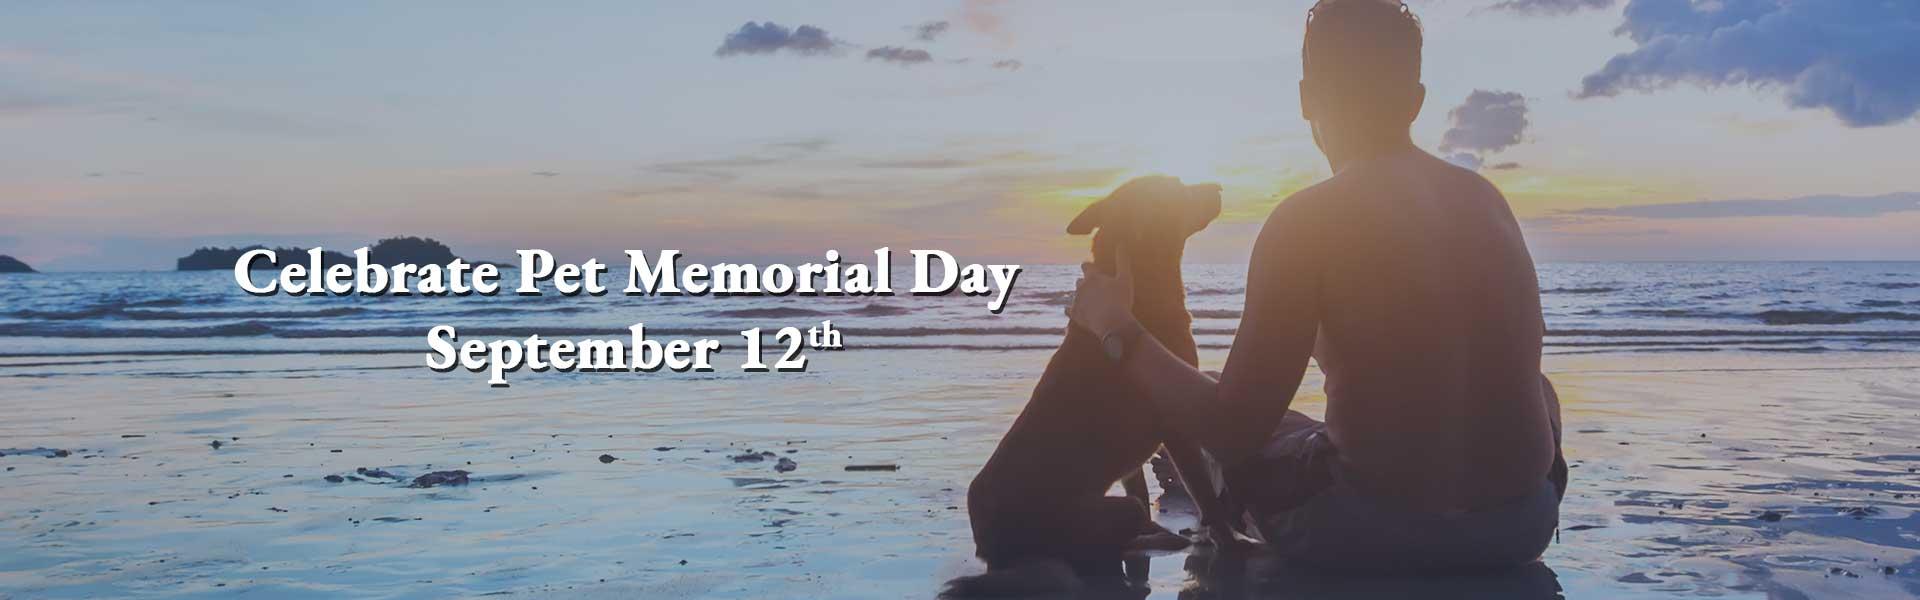 Celebrate Pet Memorial Day September 12